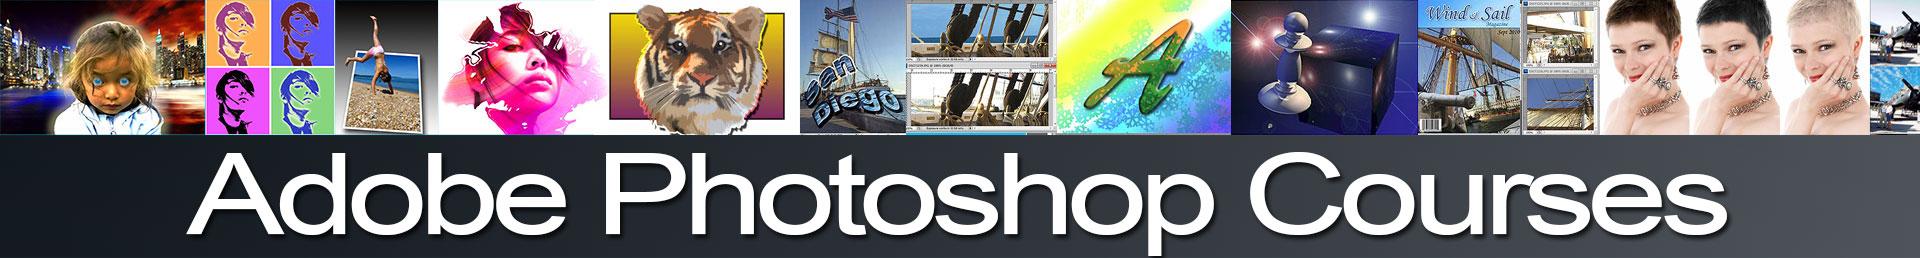 Adobe Photoshop Tutorial Courses